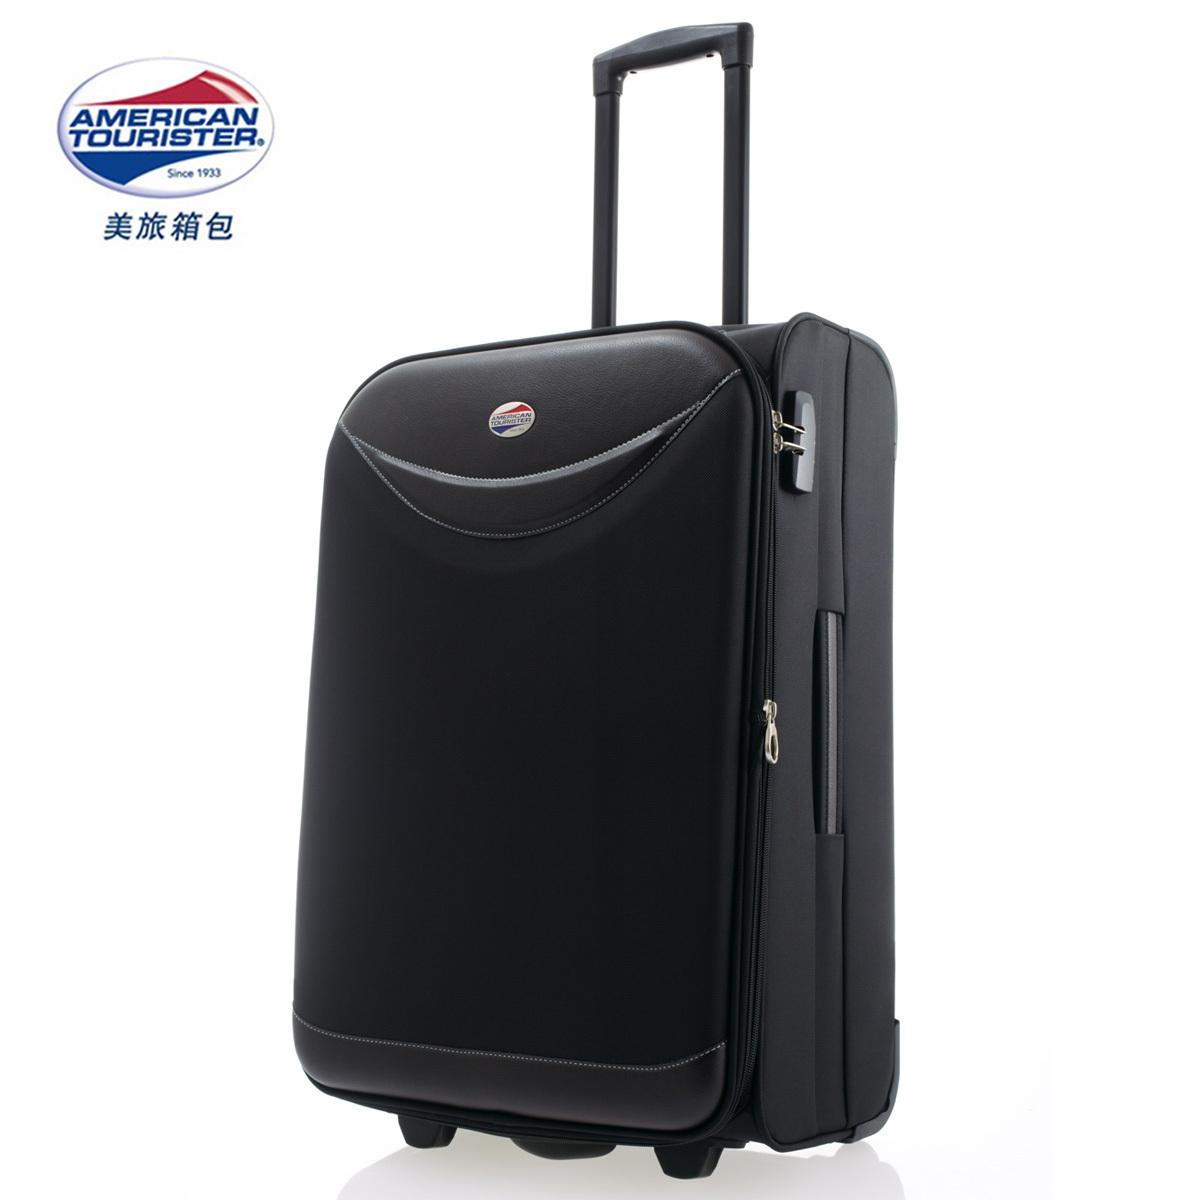 Дорожная сумка AMERICAN TOURISTER Z73 /003 24 Z73 AMERICAN TOURISTER/美旅